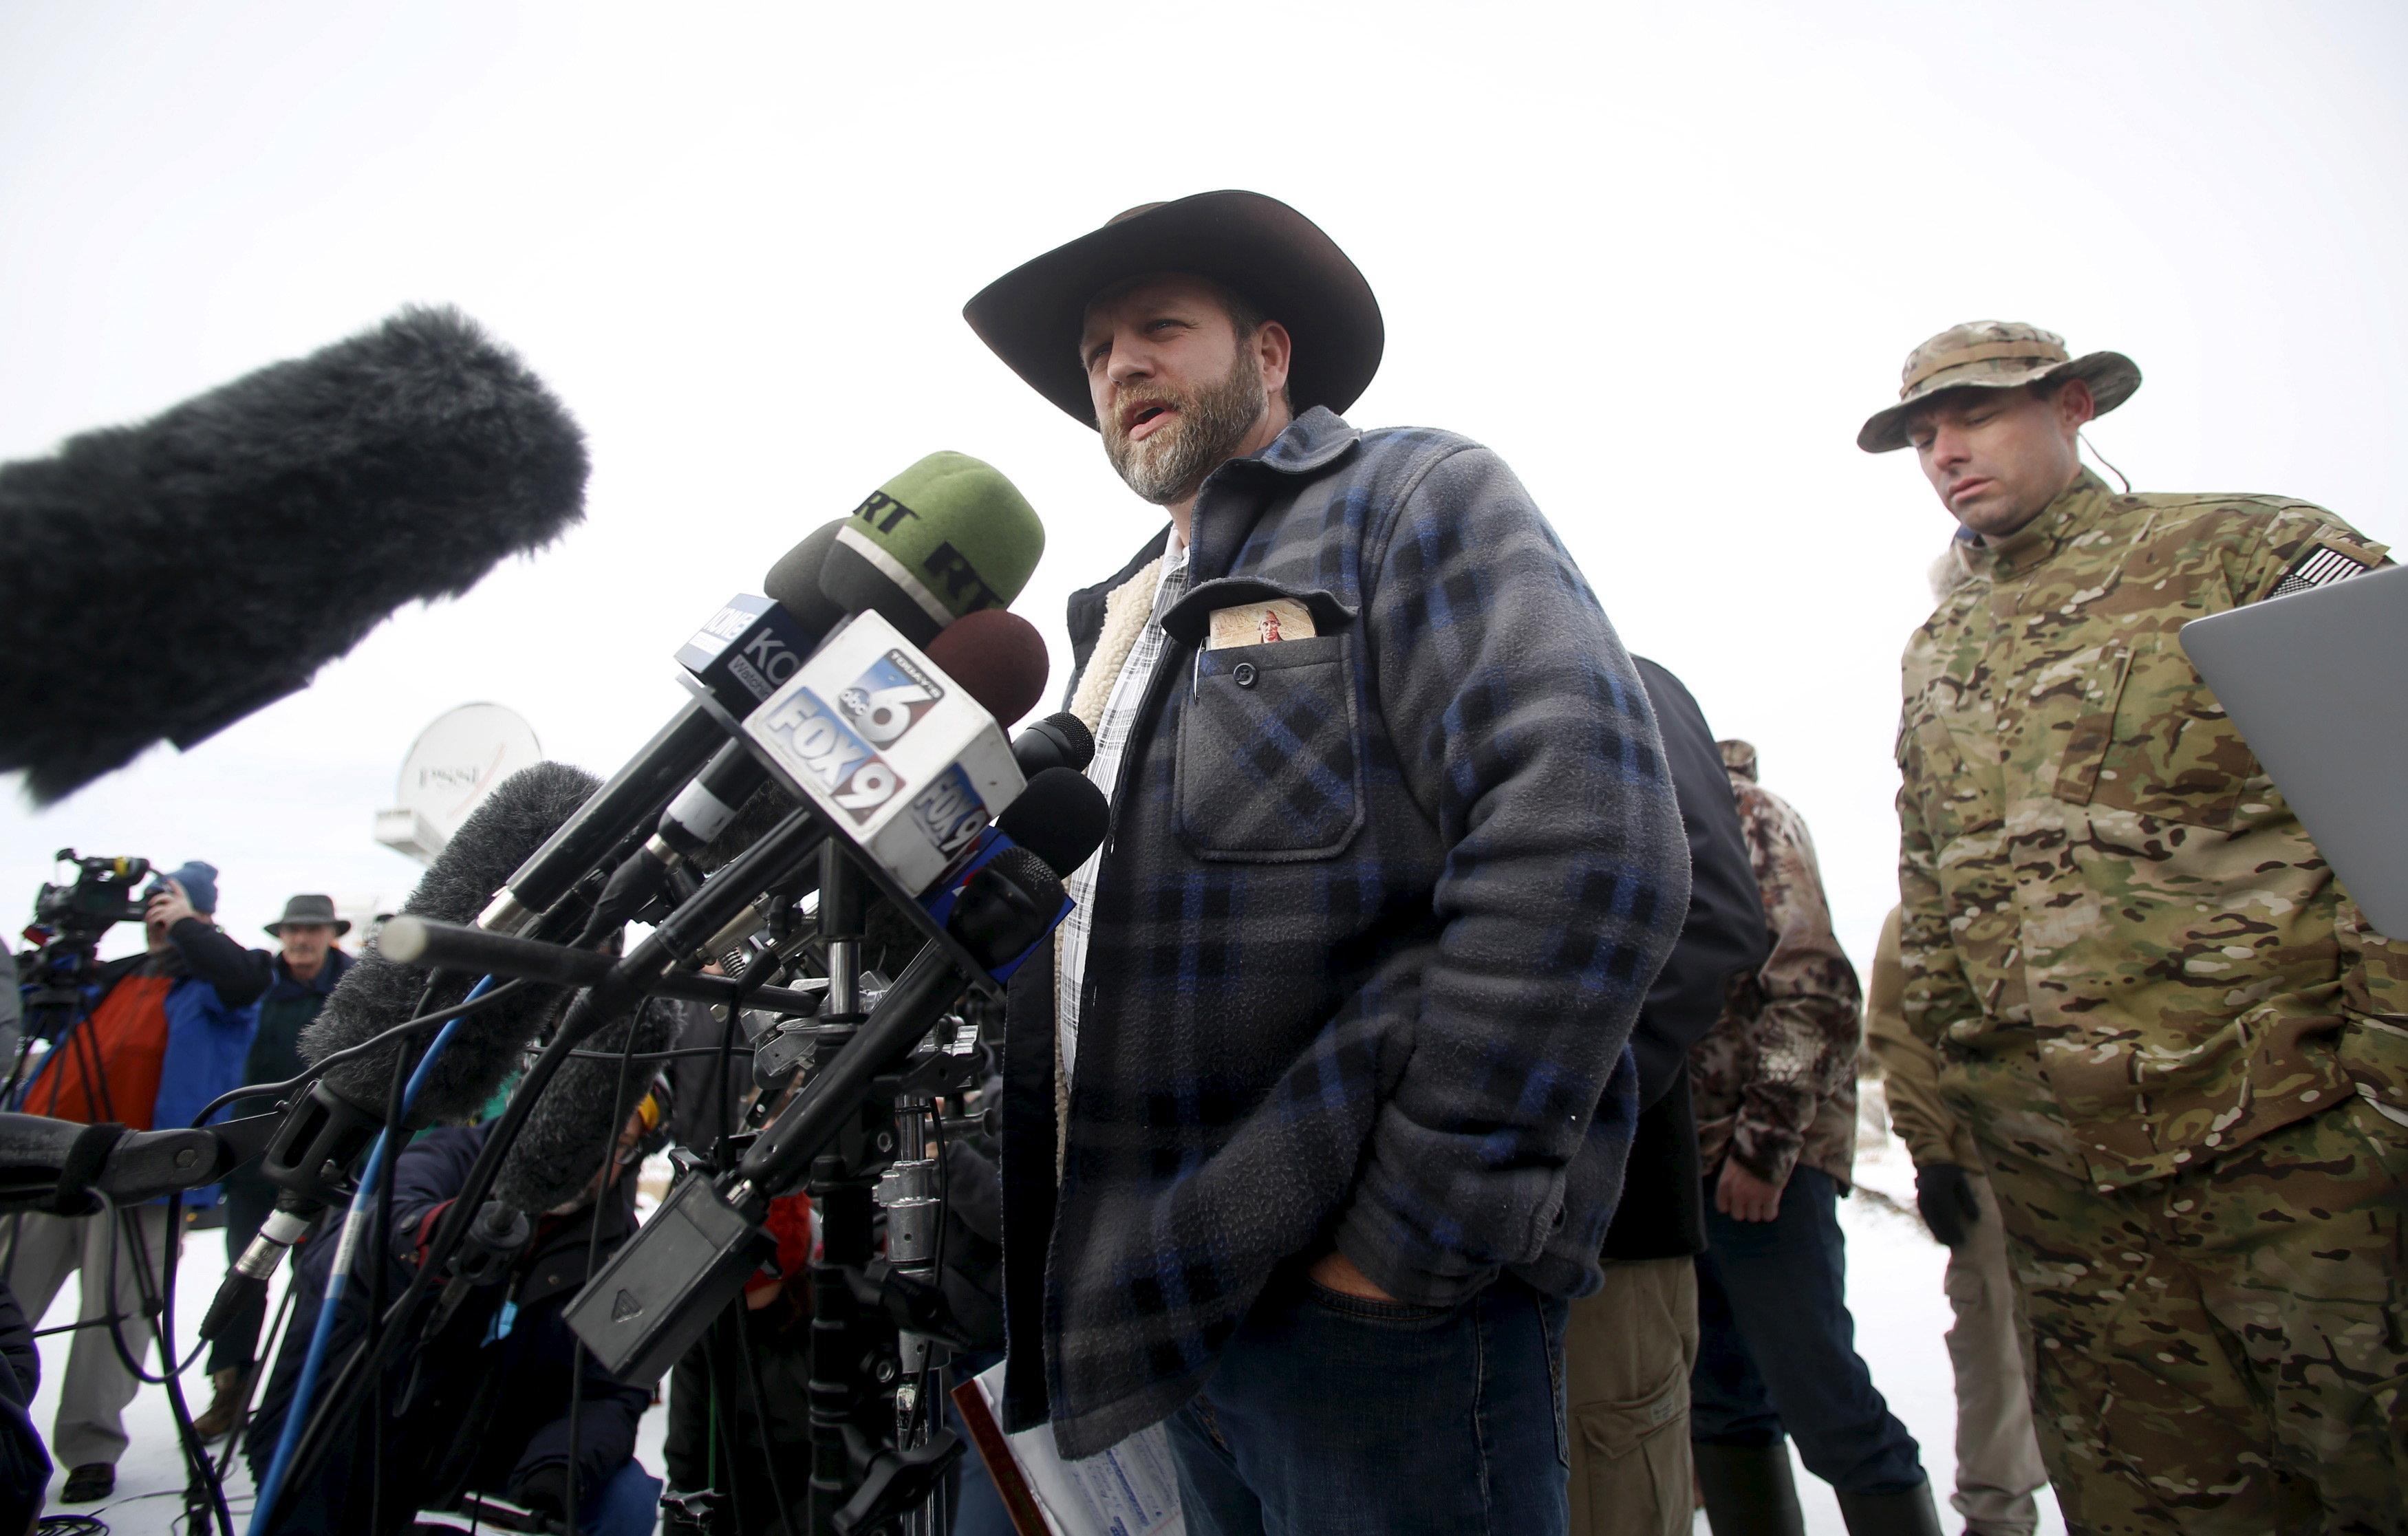 Ammon Bundy addresses the media at the Malheur National Wildlife Refuge near Burns, Oregon, January 4, 2016.